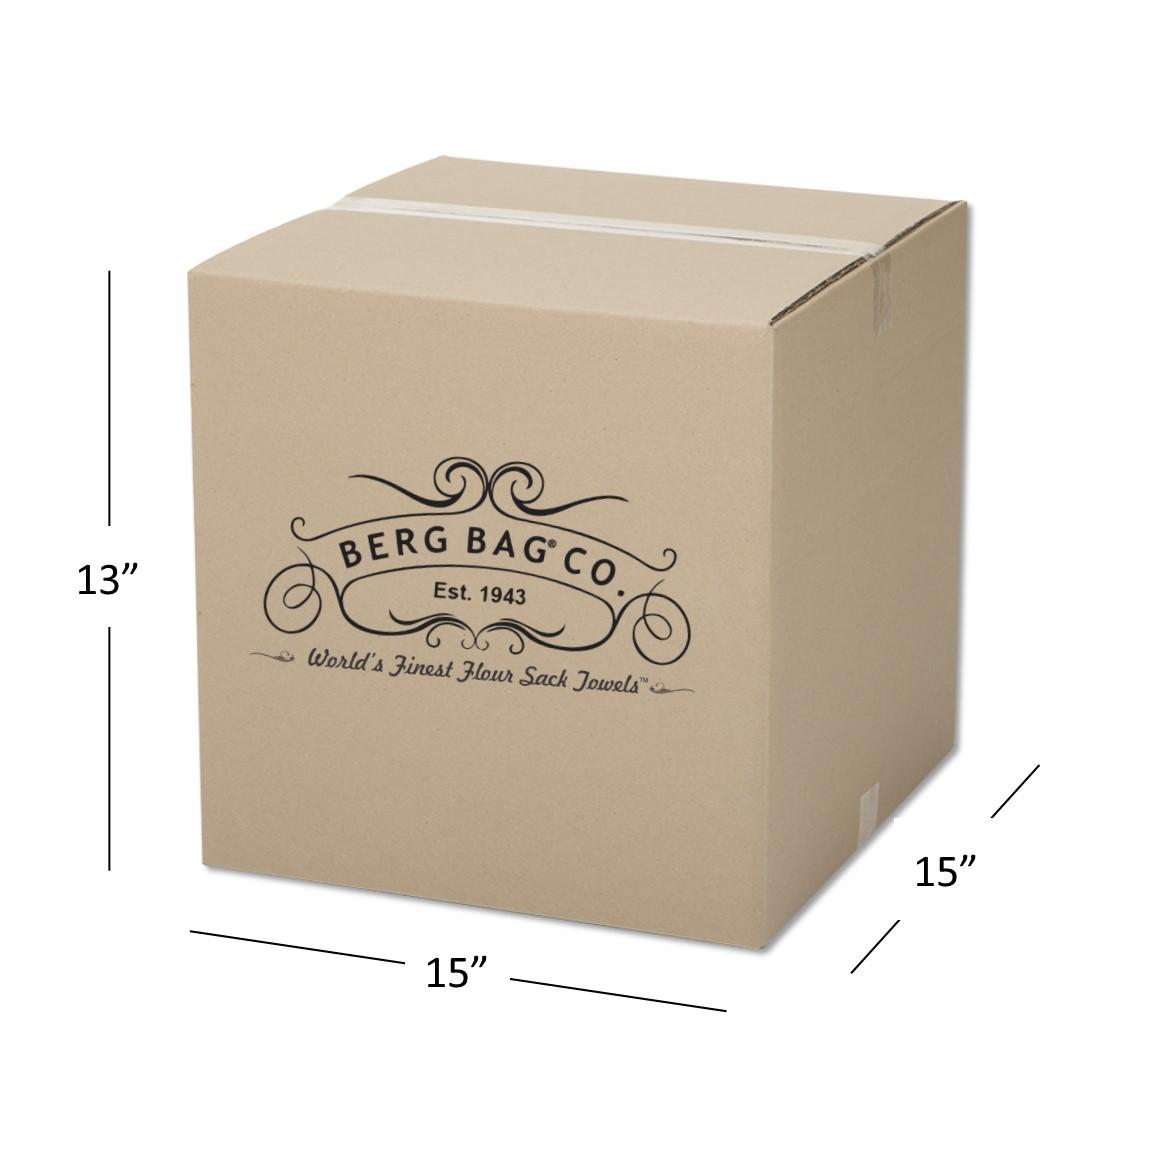 Pack of 6 Berg Bag Flour Sack Towels Bulk-30X30 White